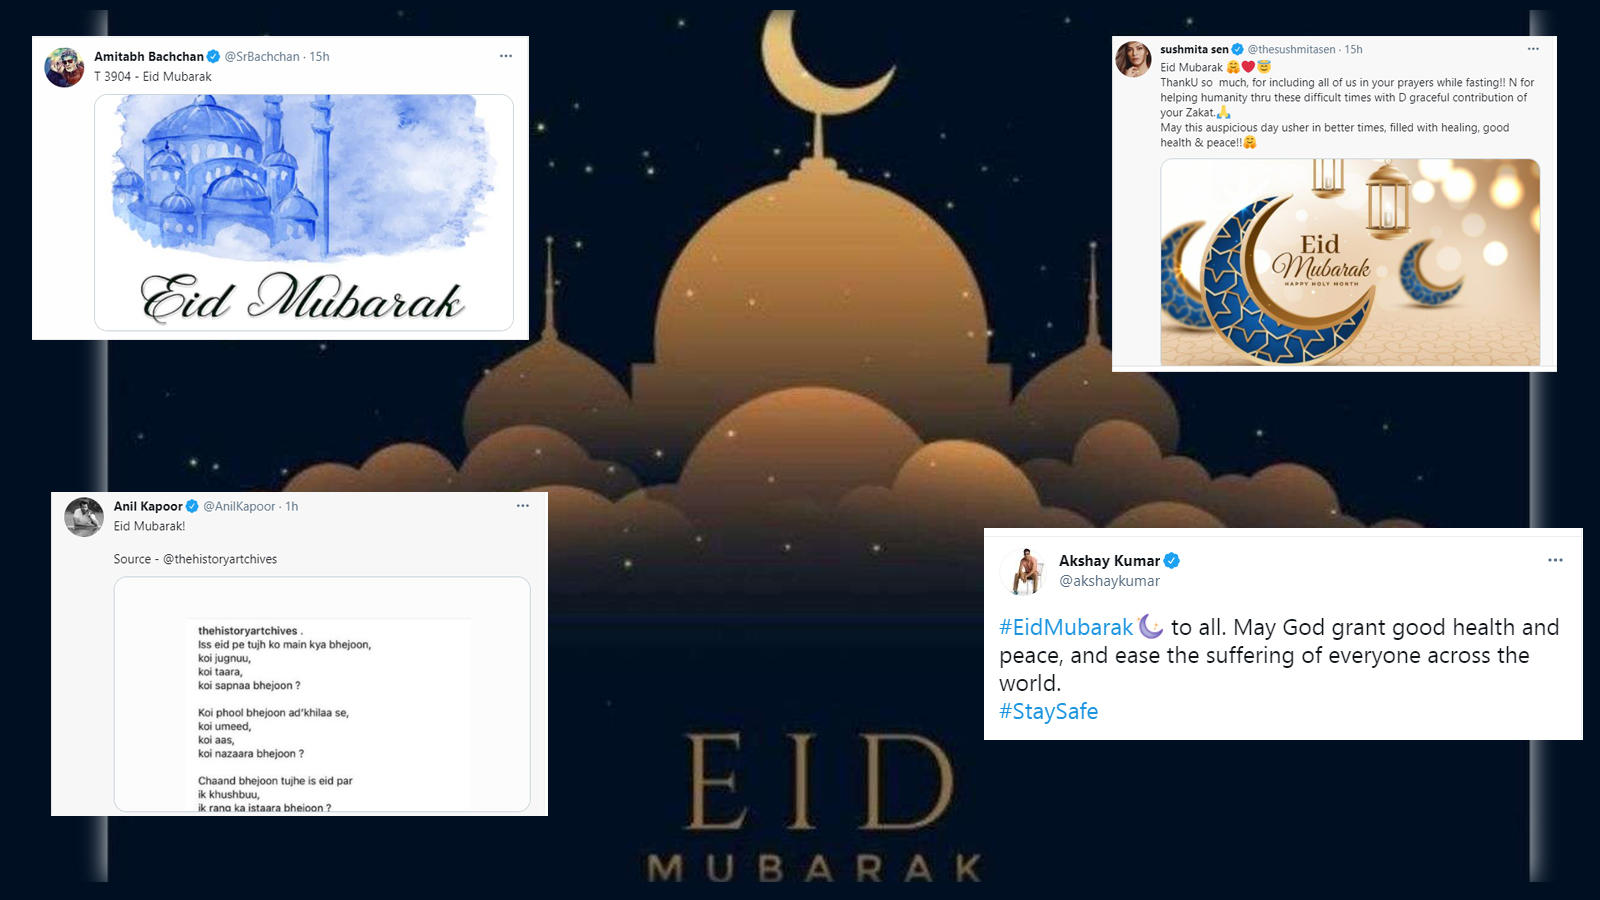 eid-ul-fitr-2021-amitabh-bachchan-anil-kapoor-sushmita-sen-akshay-kumar-among-others-wish-a-happy-eid-to-fans